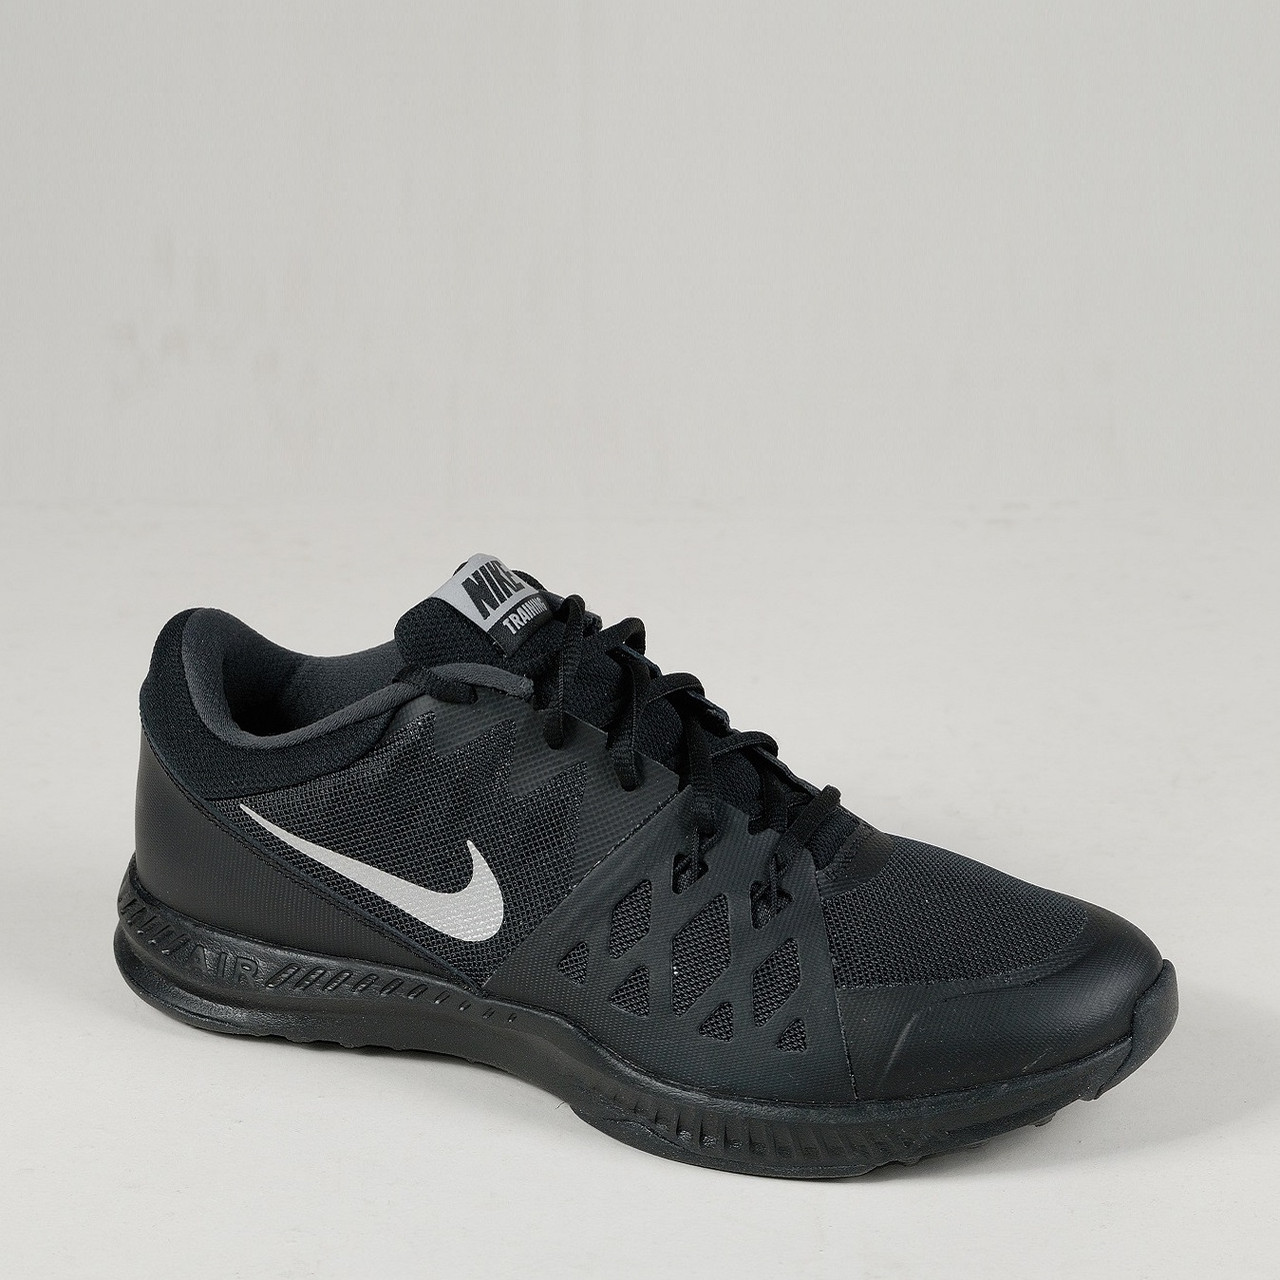 63366737 Nike Dual Fusion Run 2 Running Shoes: продажа, цена в Киеве ...